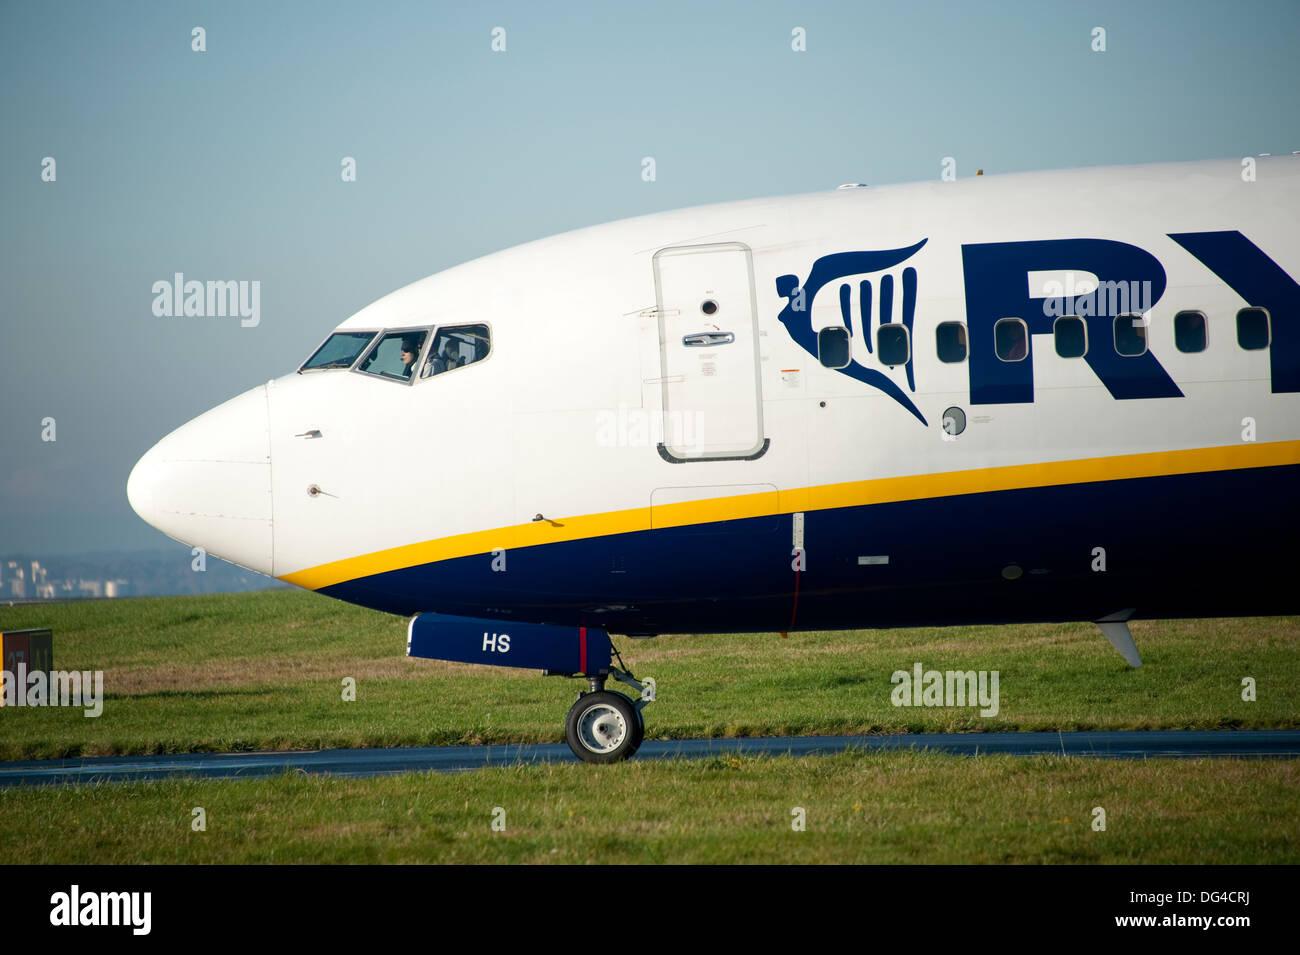 Ryanair Jet Plane on runway at Liverpool Airport - Stock Image